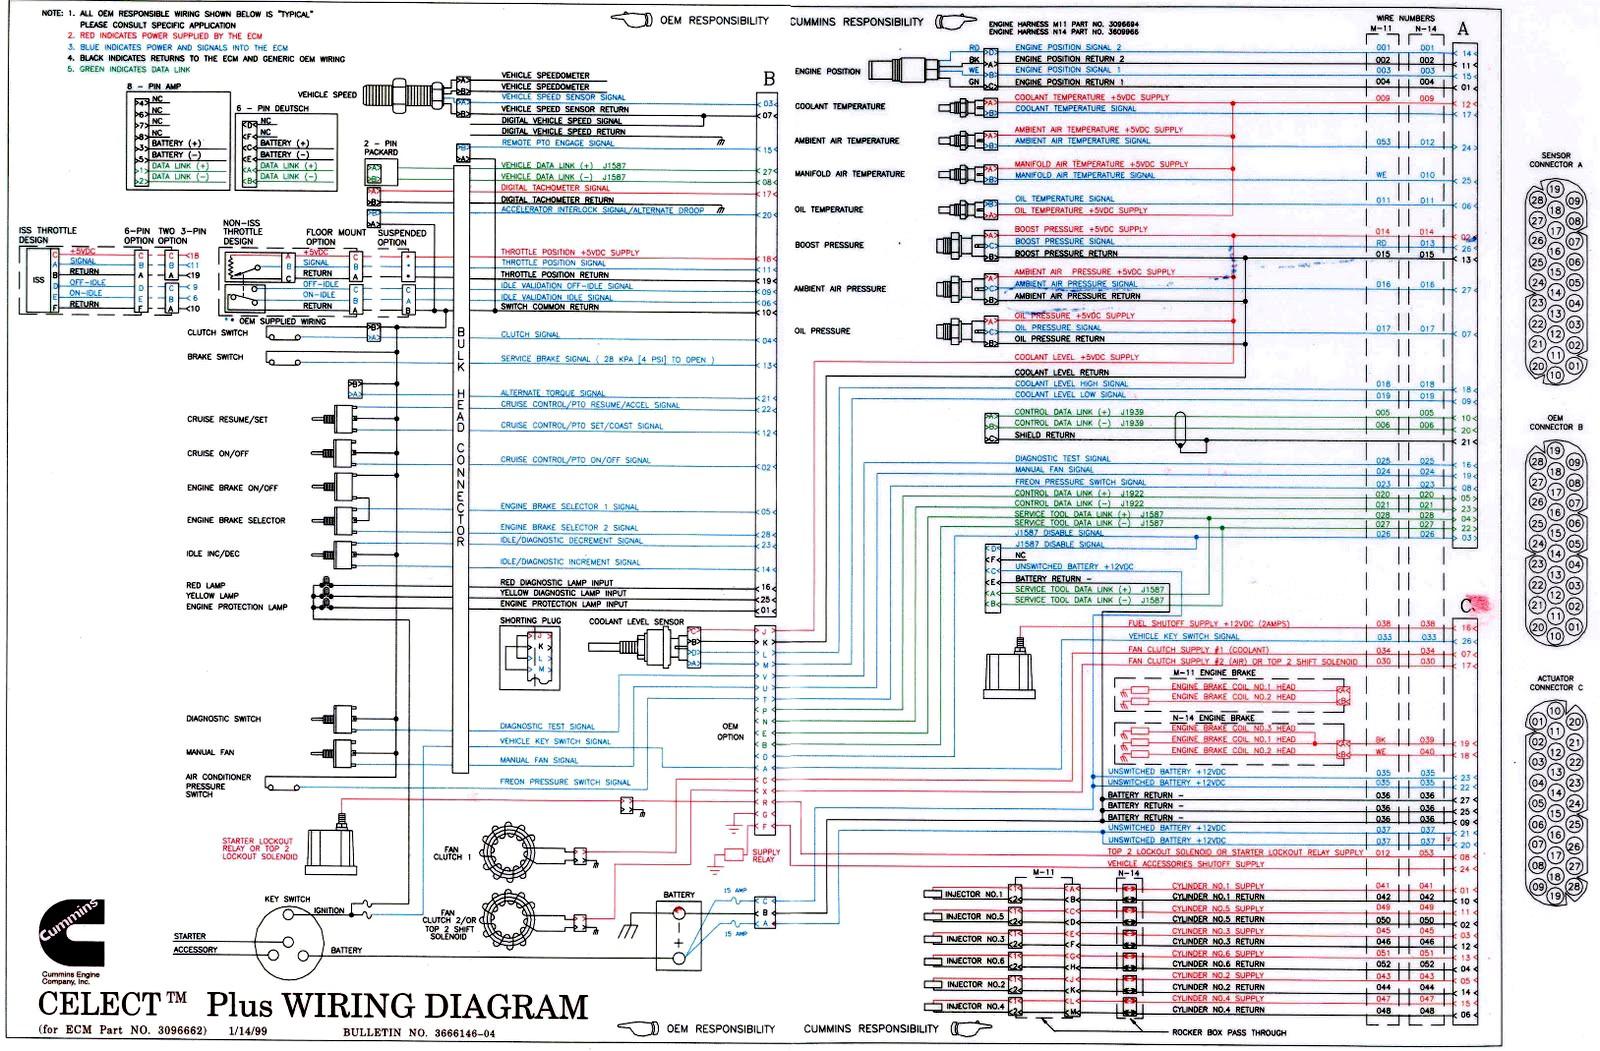 m11 wiring diagram wiring diagram portal basic electrical schematic diagrams m11 wiring diagram [ 1600 x 1051 Pixel ]